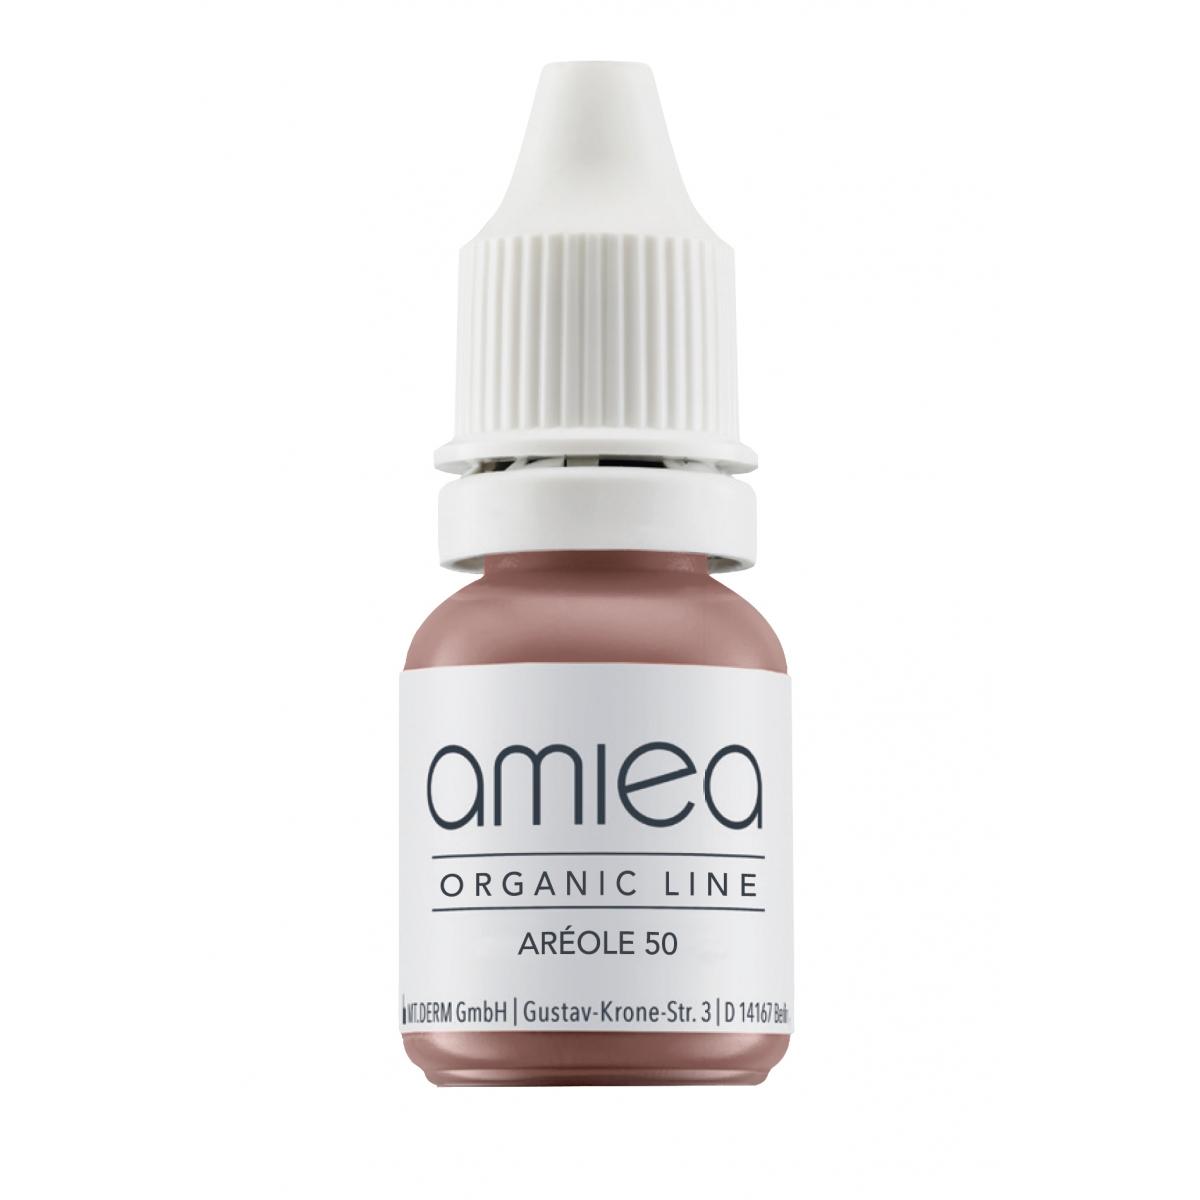 ORGANIC LINE (10ml) - PIGMENT AREOLES 50 ORGANICLINE AMIEA (10 ml)